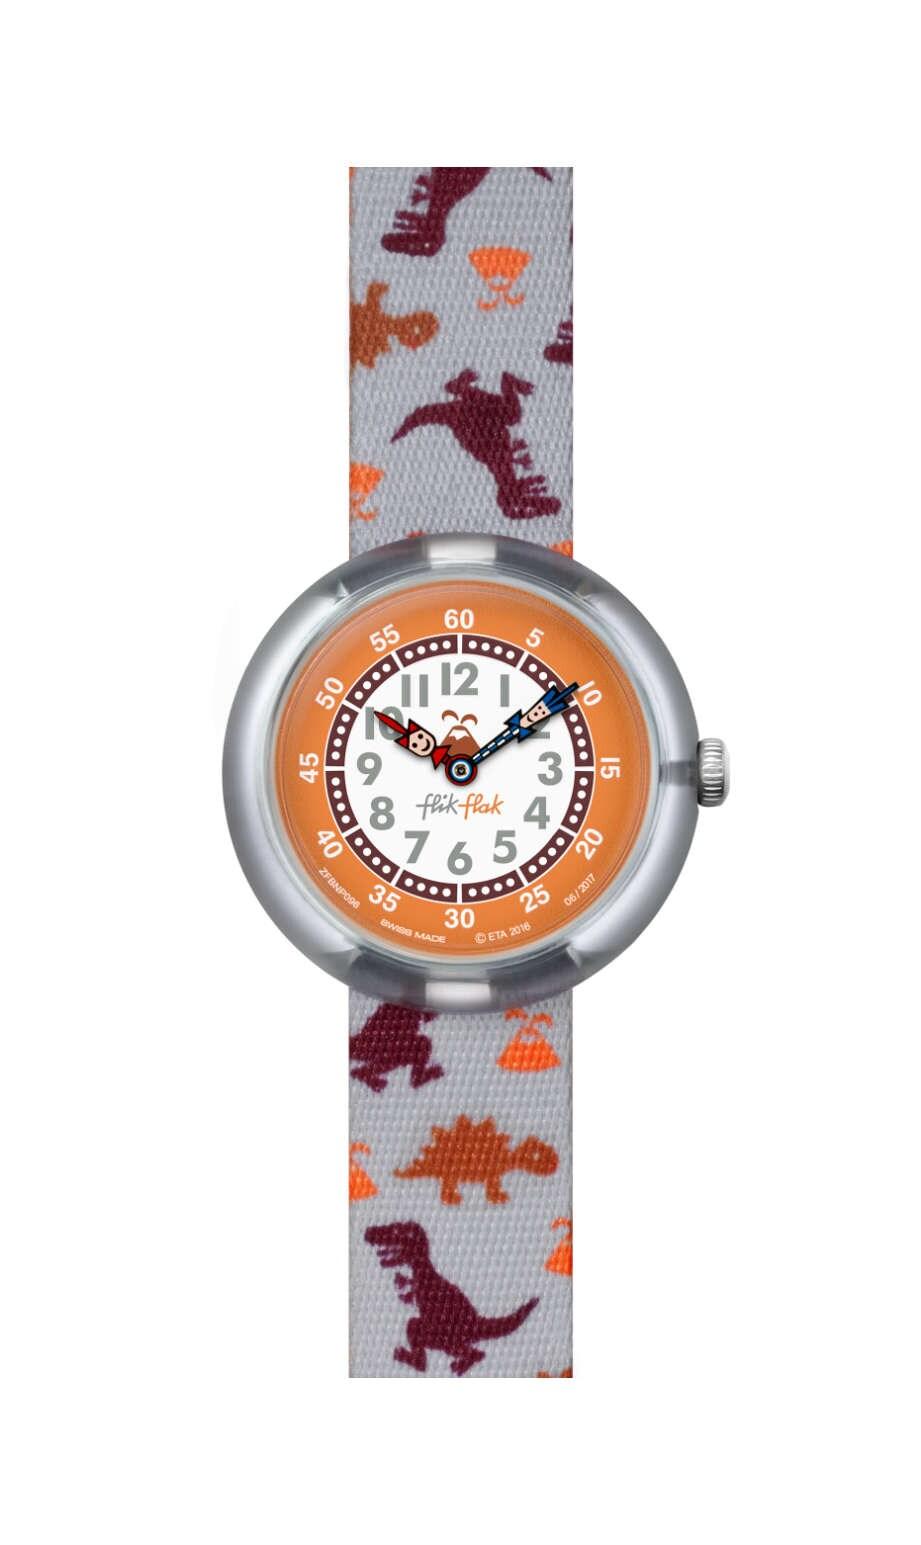 Swatch - FLIK REX - 1